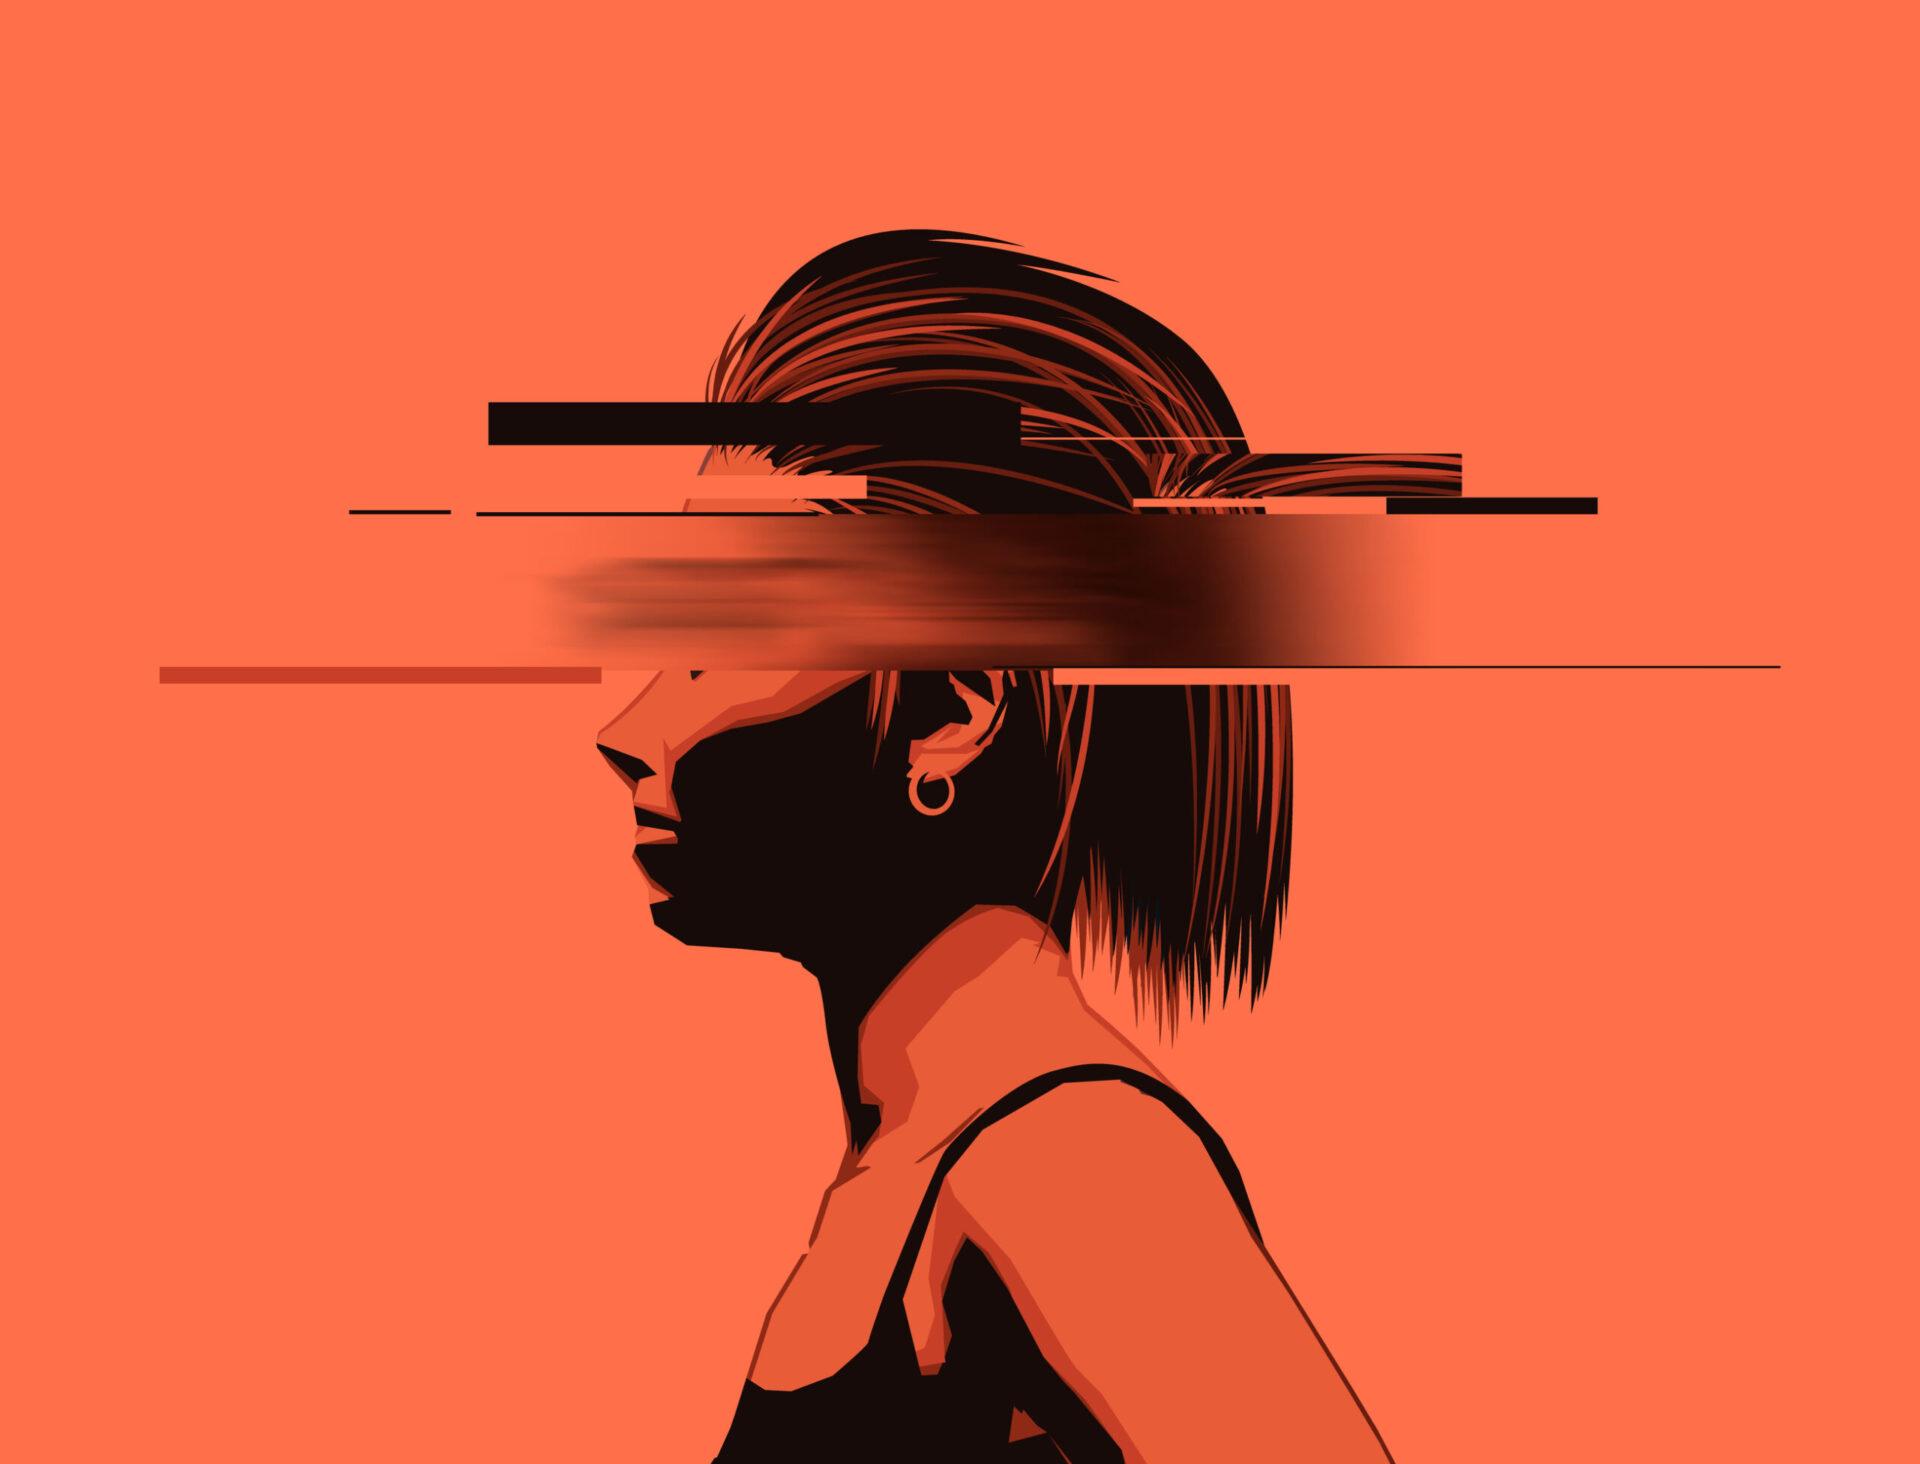 tulburări psihice